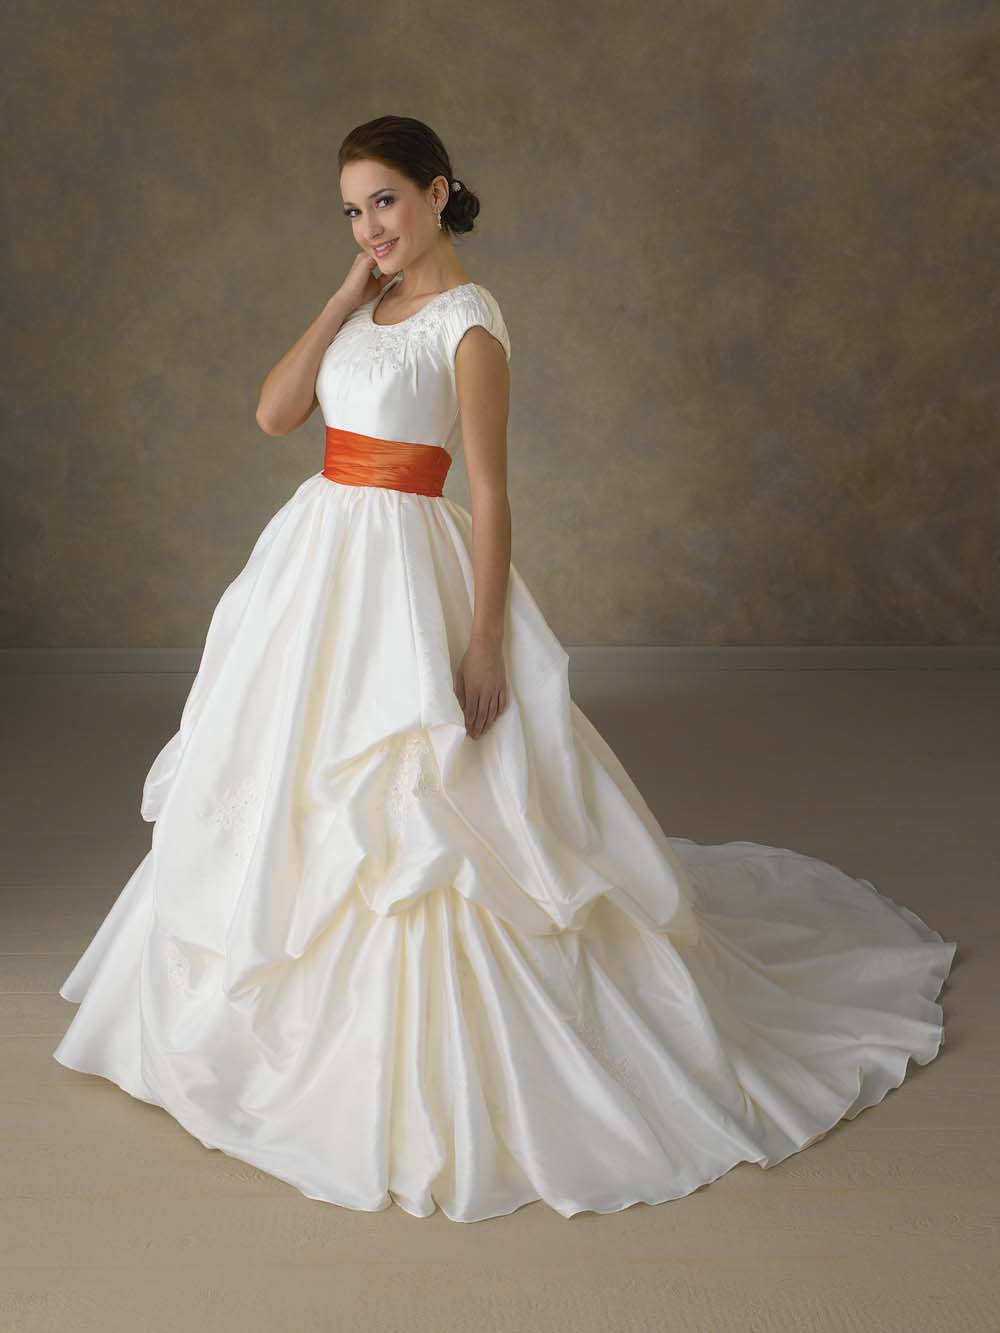 Wedding gown giveaway on bonny 39 s blog for Wedding sashes for dresses